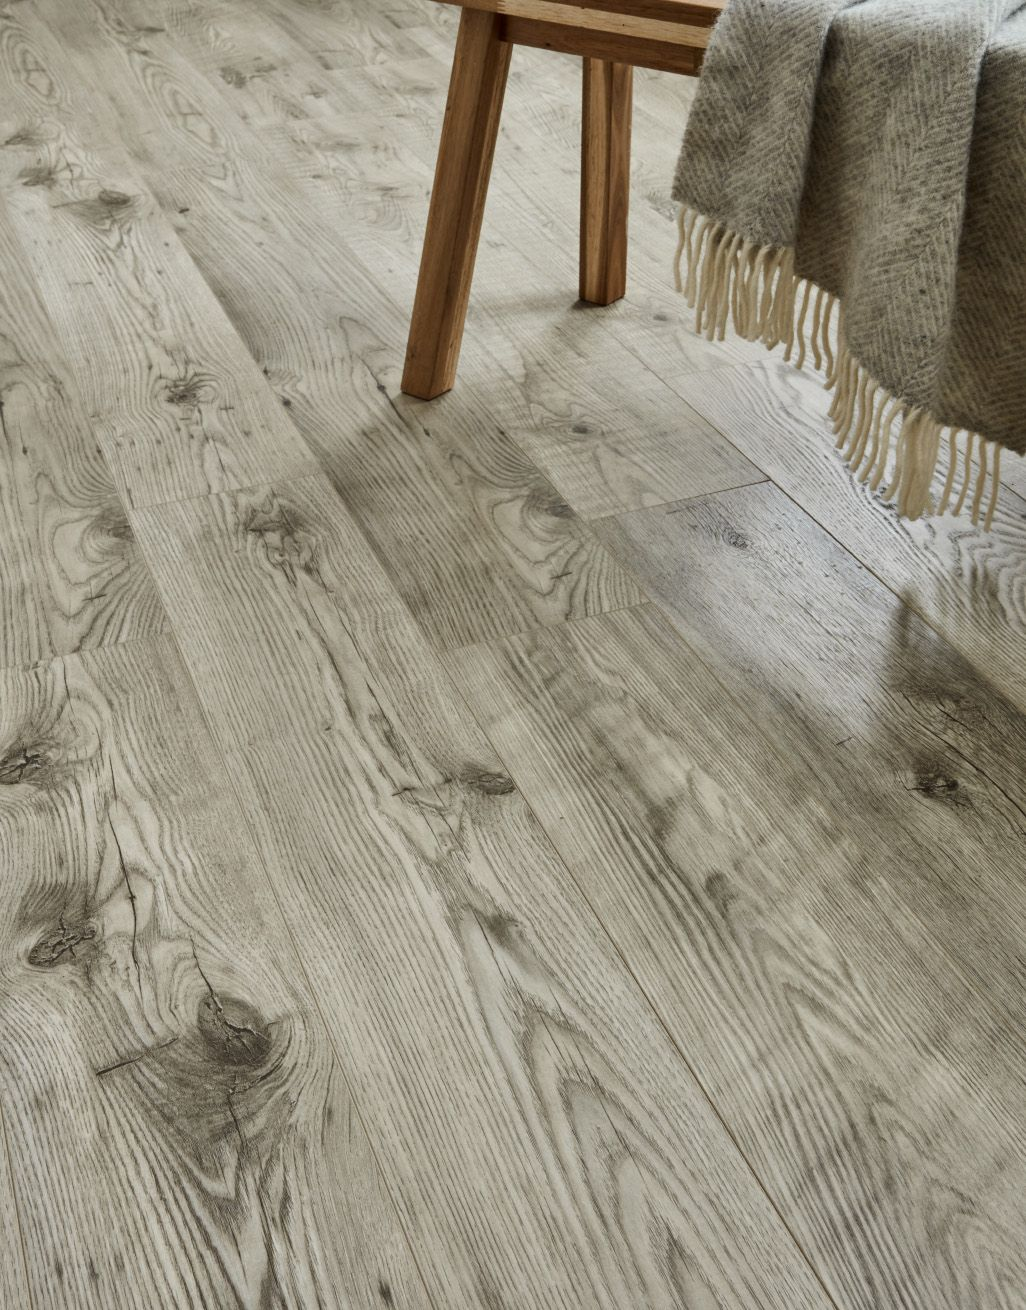 Wellington Chestnut Laminate Flooring, Wellington Flooring Laminate